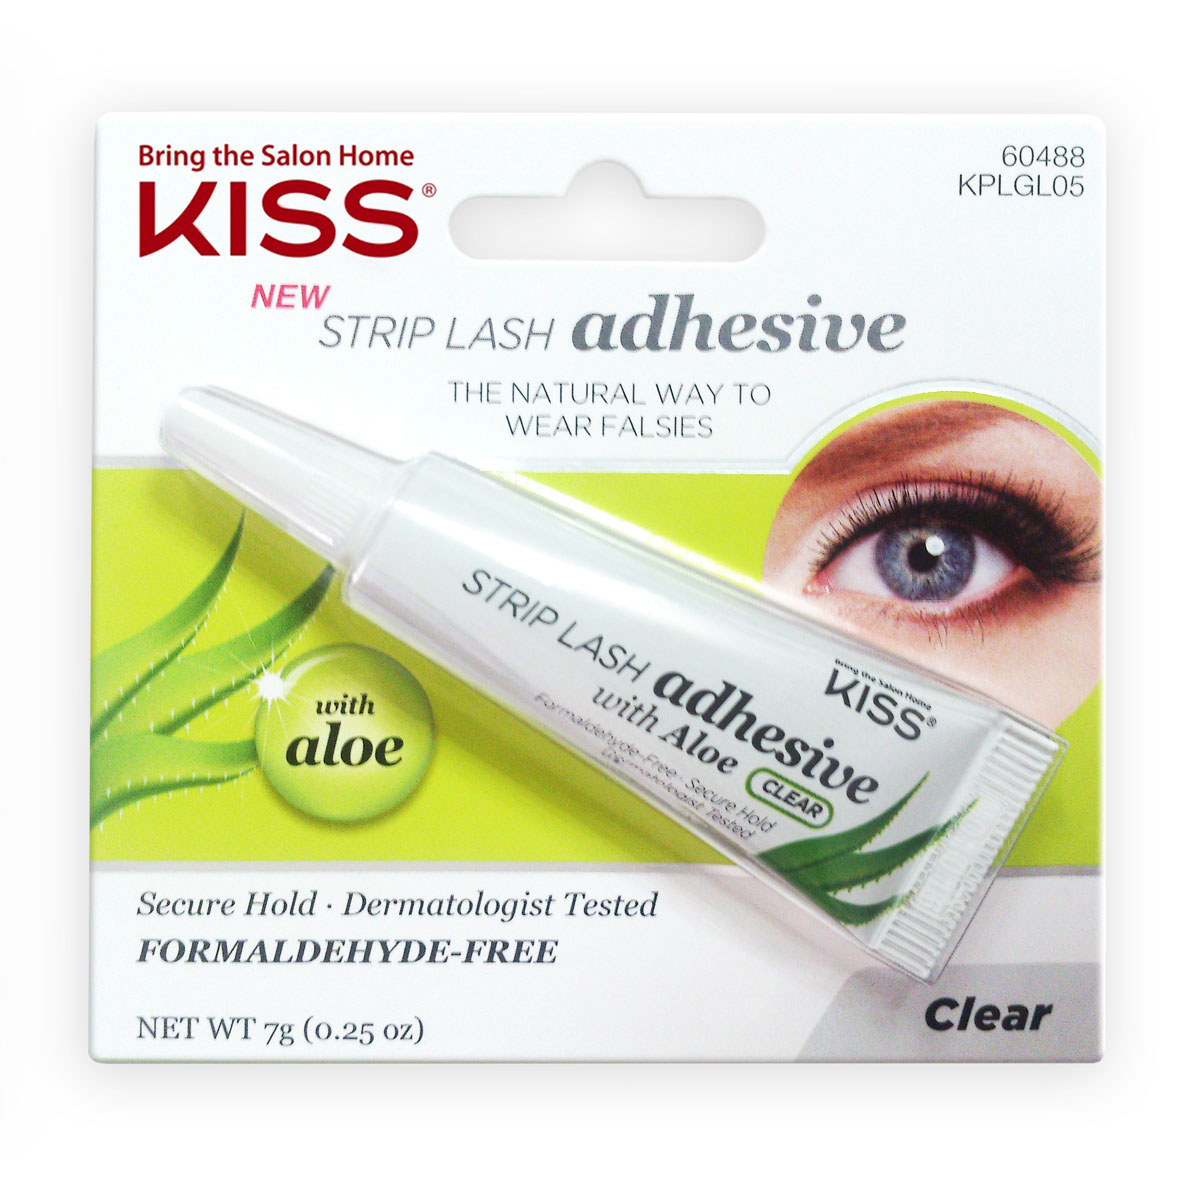 Kiss Клей с алое для накладных ресниц, Прозрачный Strip Lash Adhesive KPLGL05